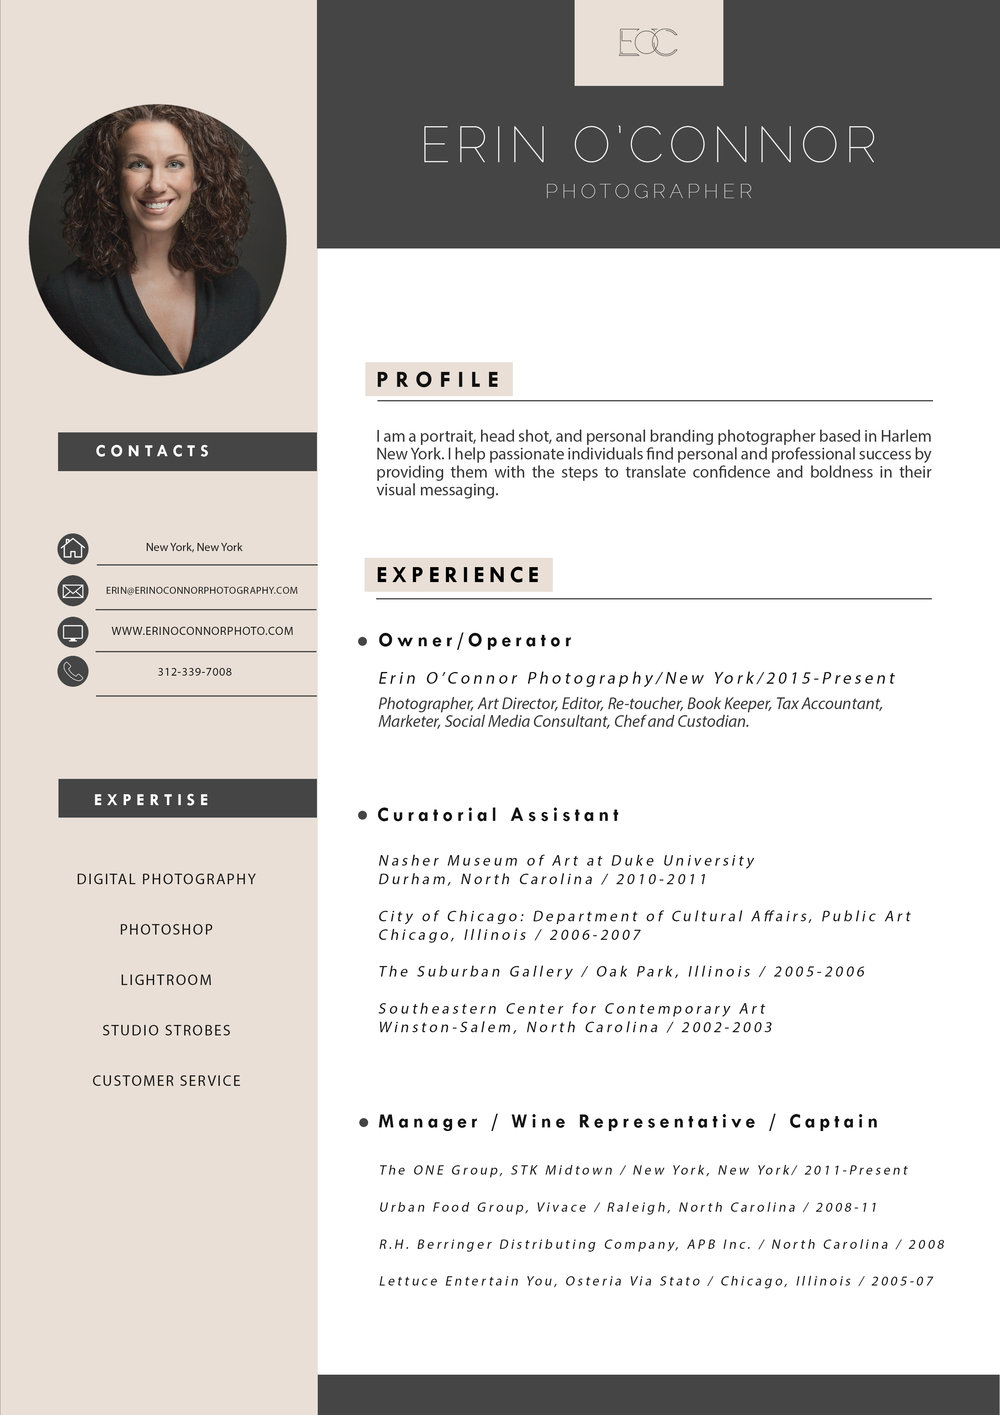 Resume-eophotonyc-1of2.jpg